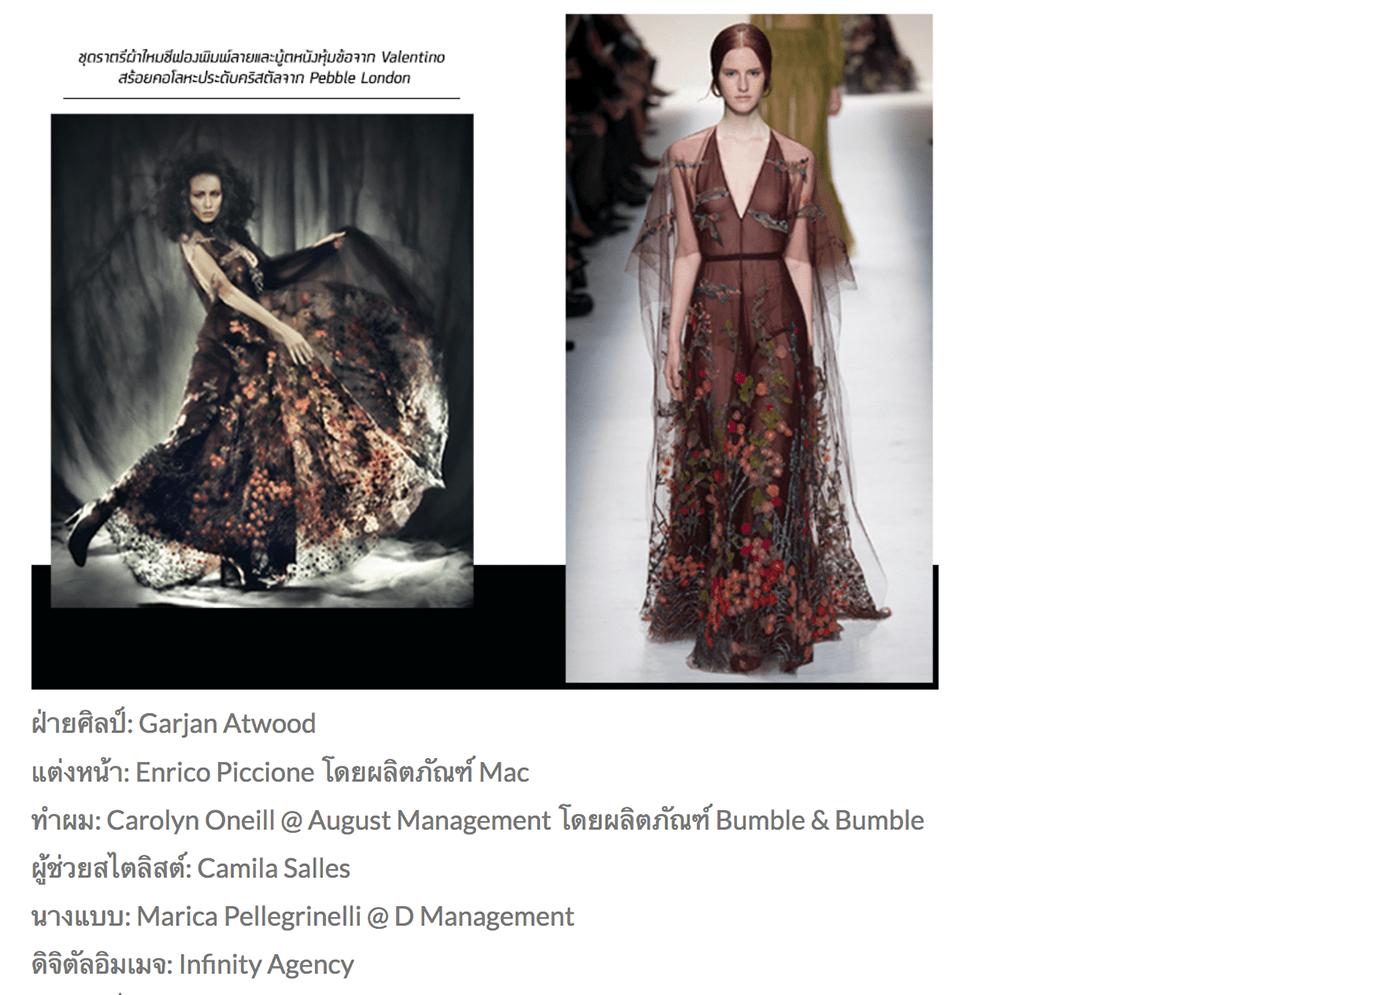 L'Officiel Thailand L'Officiel fashion editorial Infinity Agency garjan atwood Marla Lombardo Marica Pellegrinelli